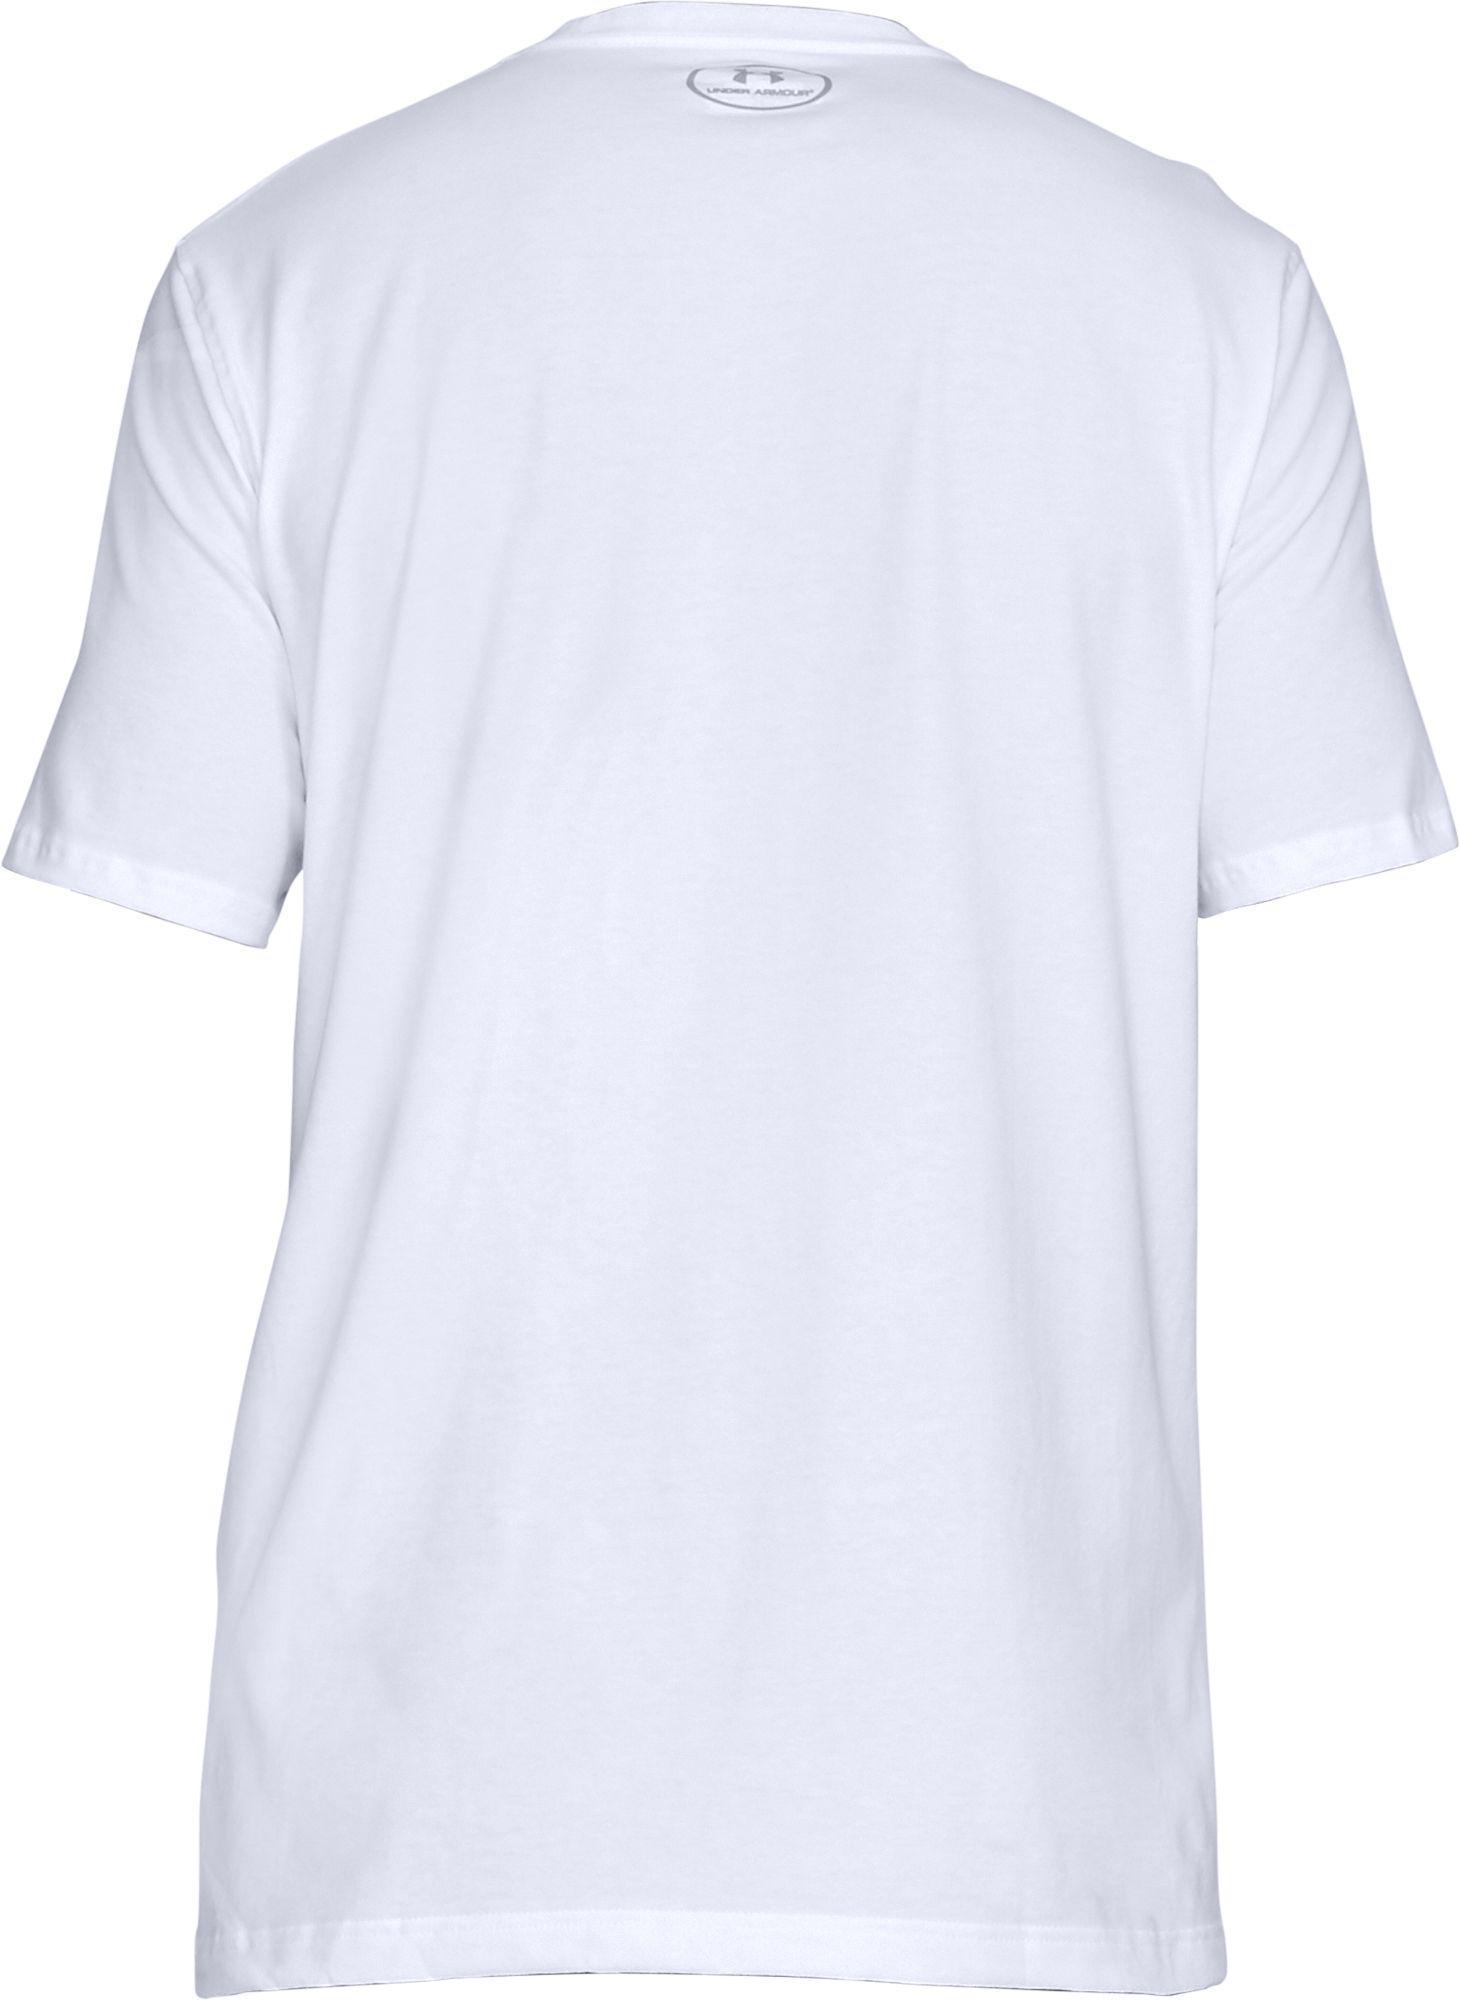 592b05669 Hanes Beefy T Shirts Australia